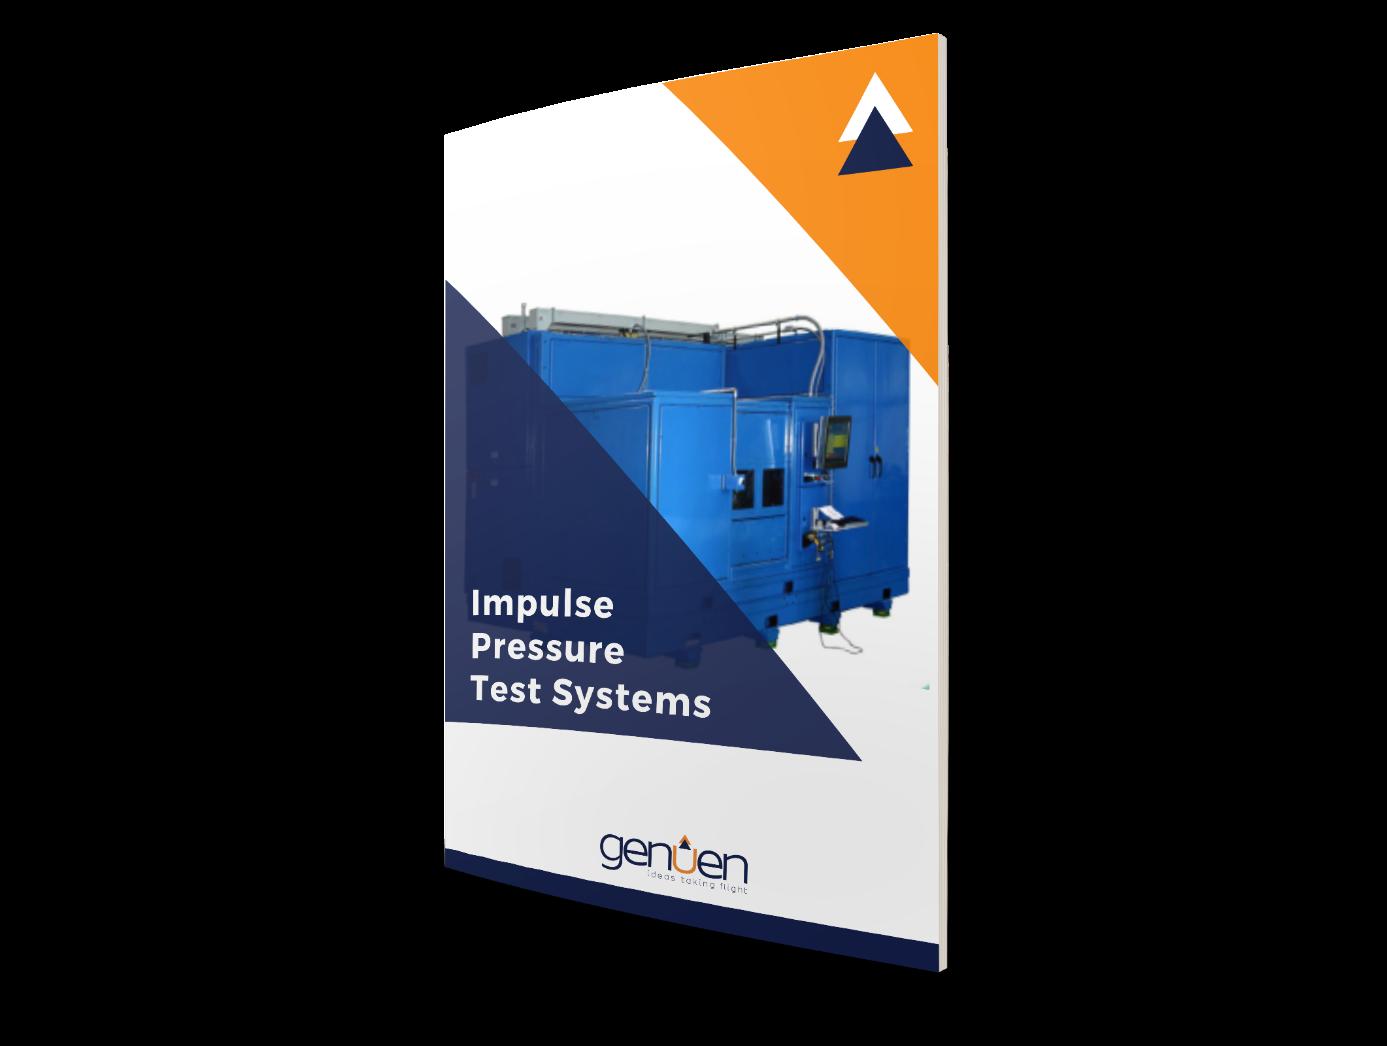 3D Impulse pressure test systems